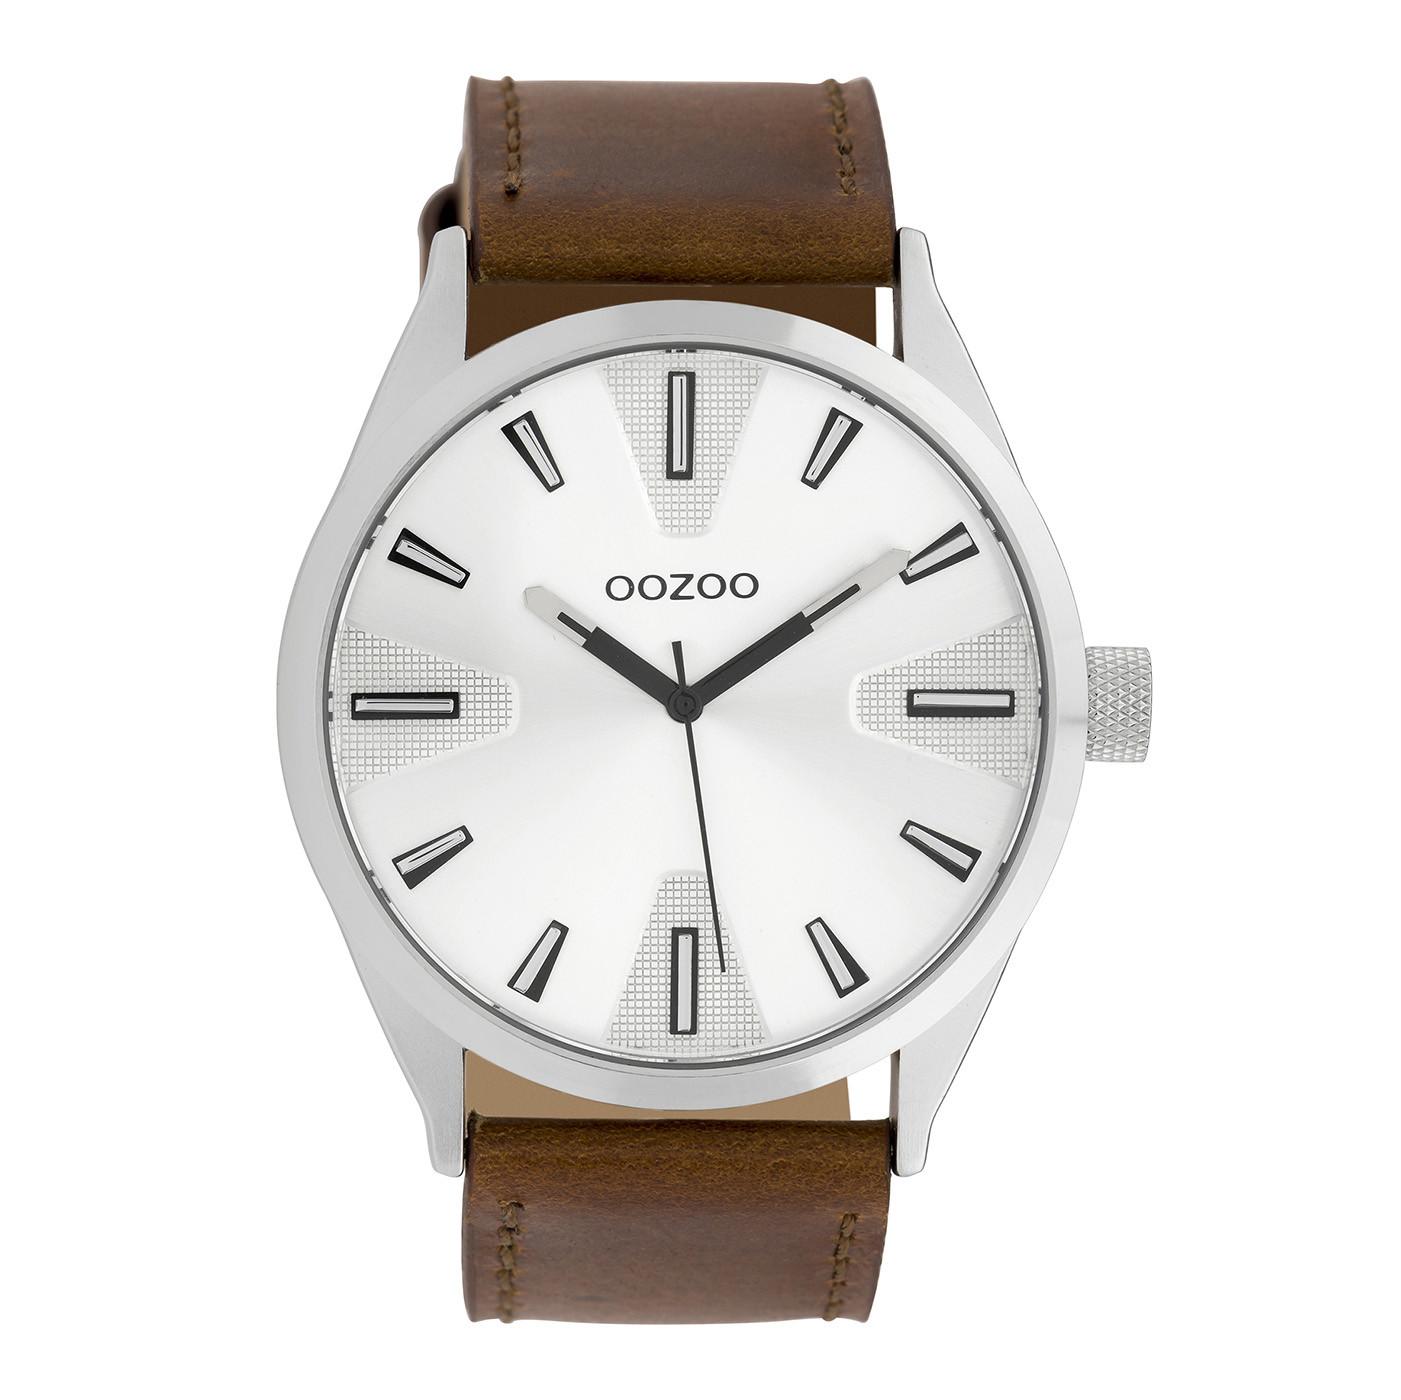 OOZOO Timepieces Bruin/Wit horloge C10020 (46 mm)